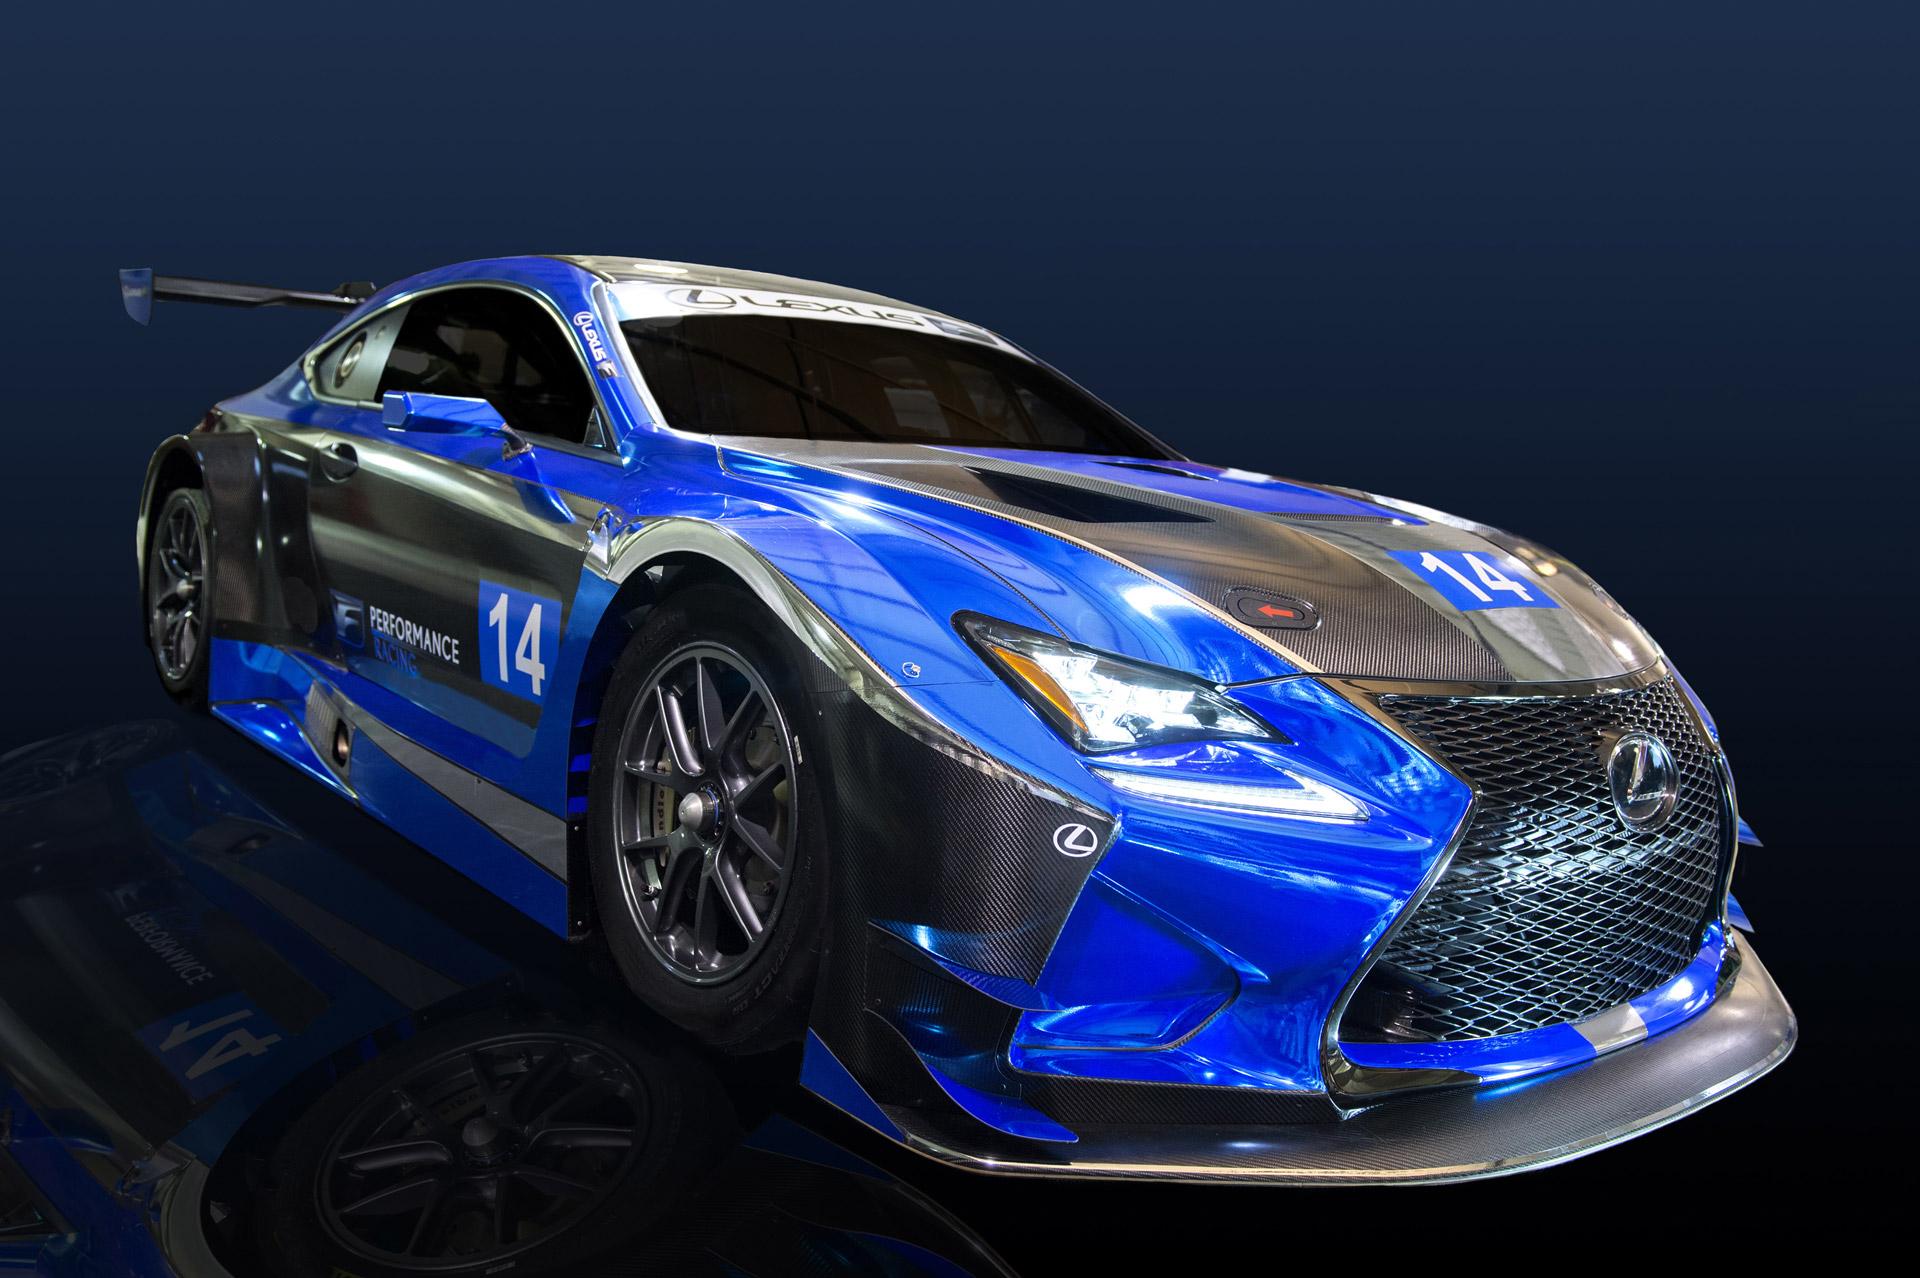 Lexus To Enter Imsa Weathertech Sportscar Championship With Rc F Gt3